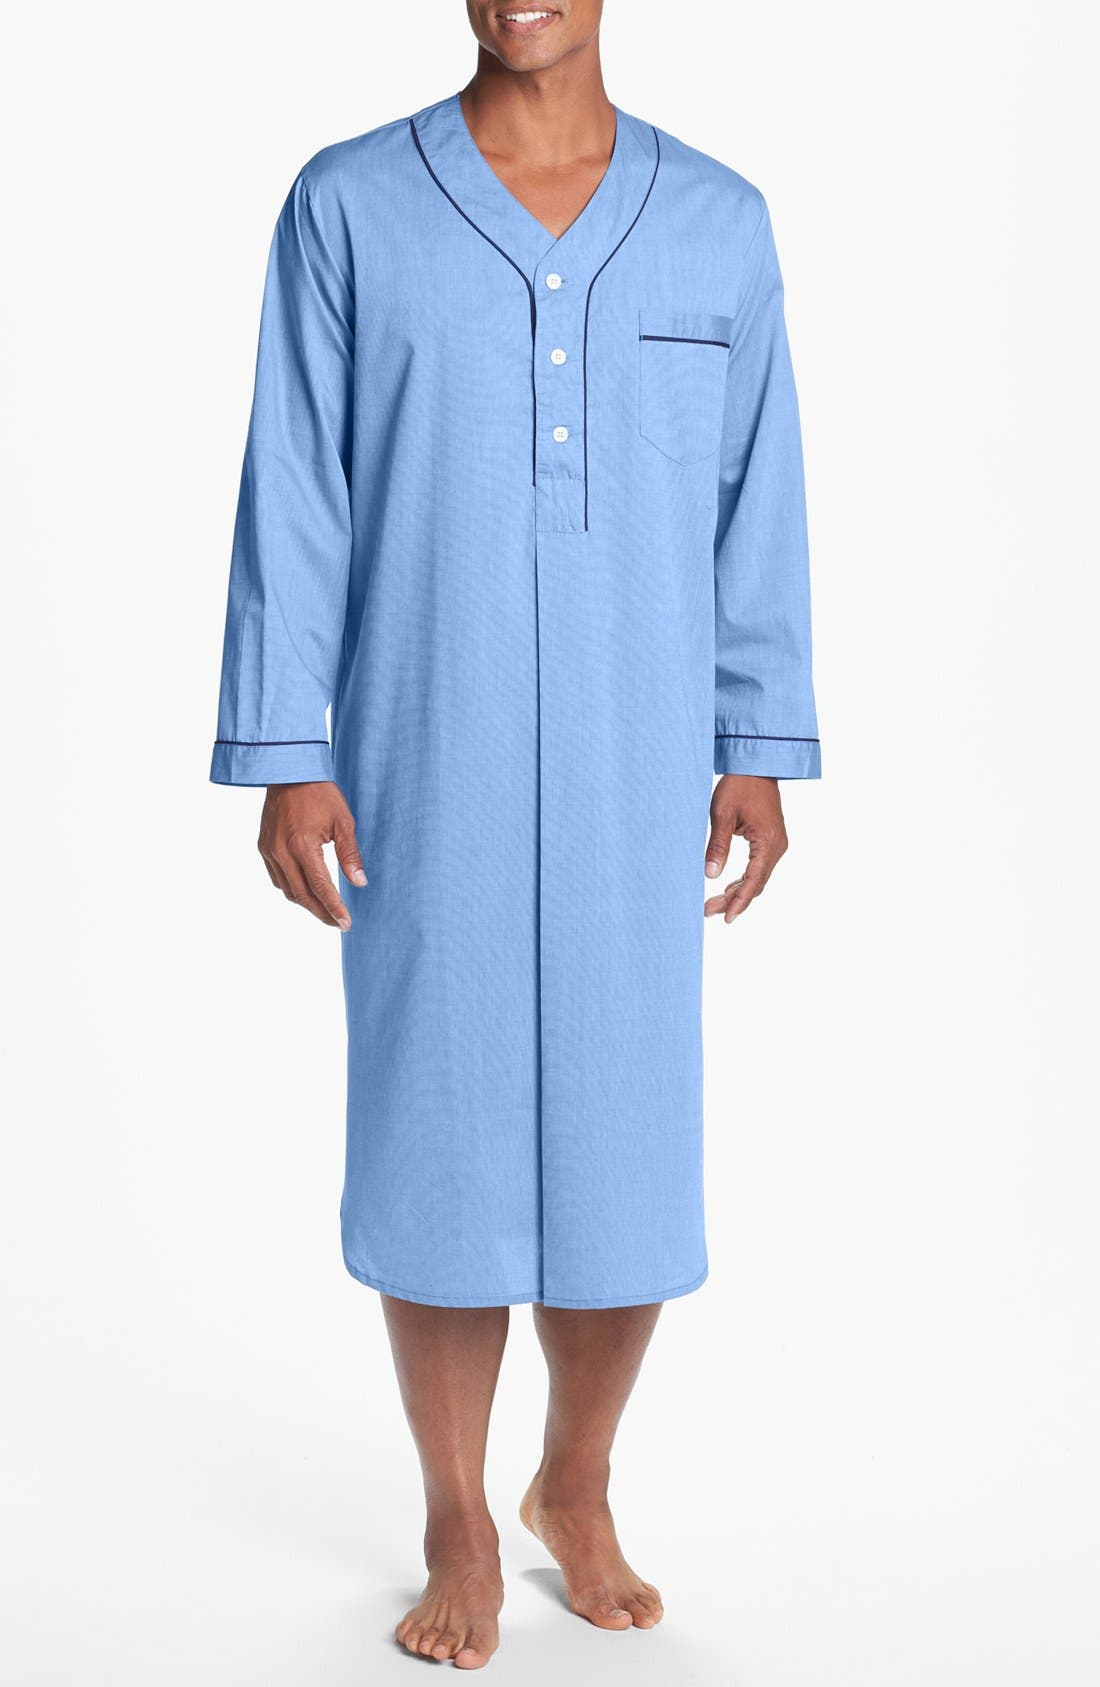 Main Image - Majestic International Cotton Nightshirt